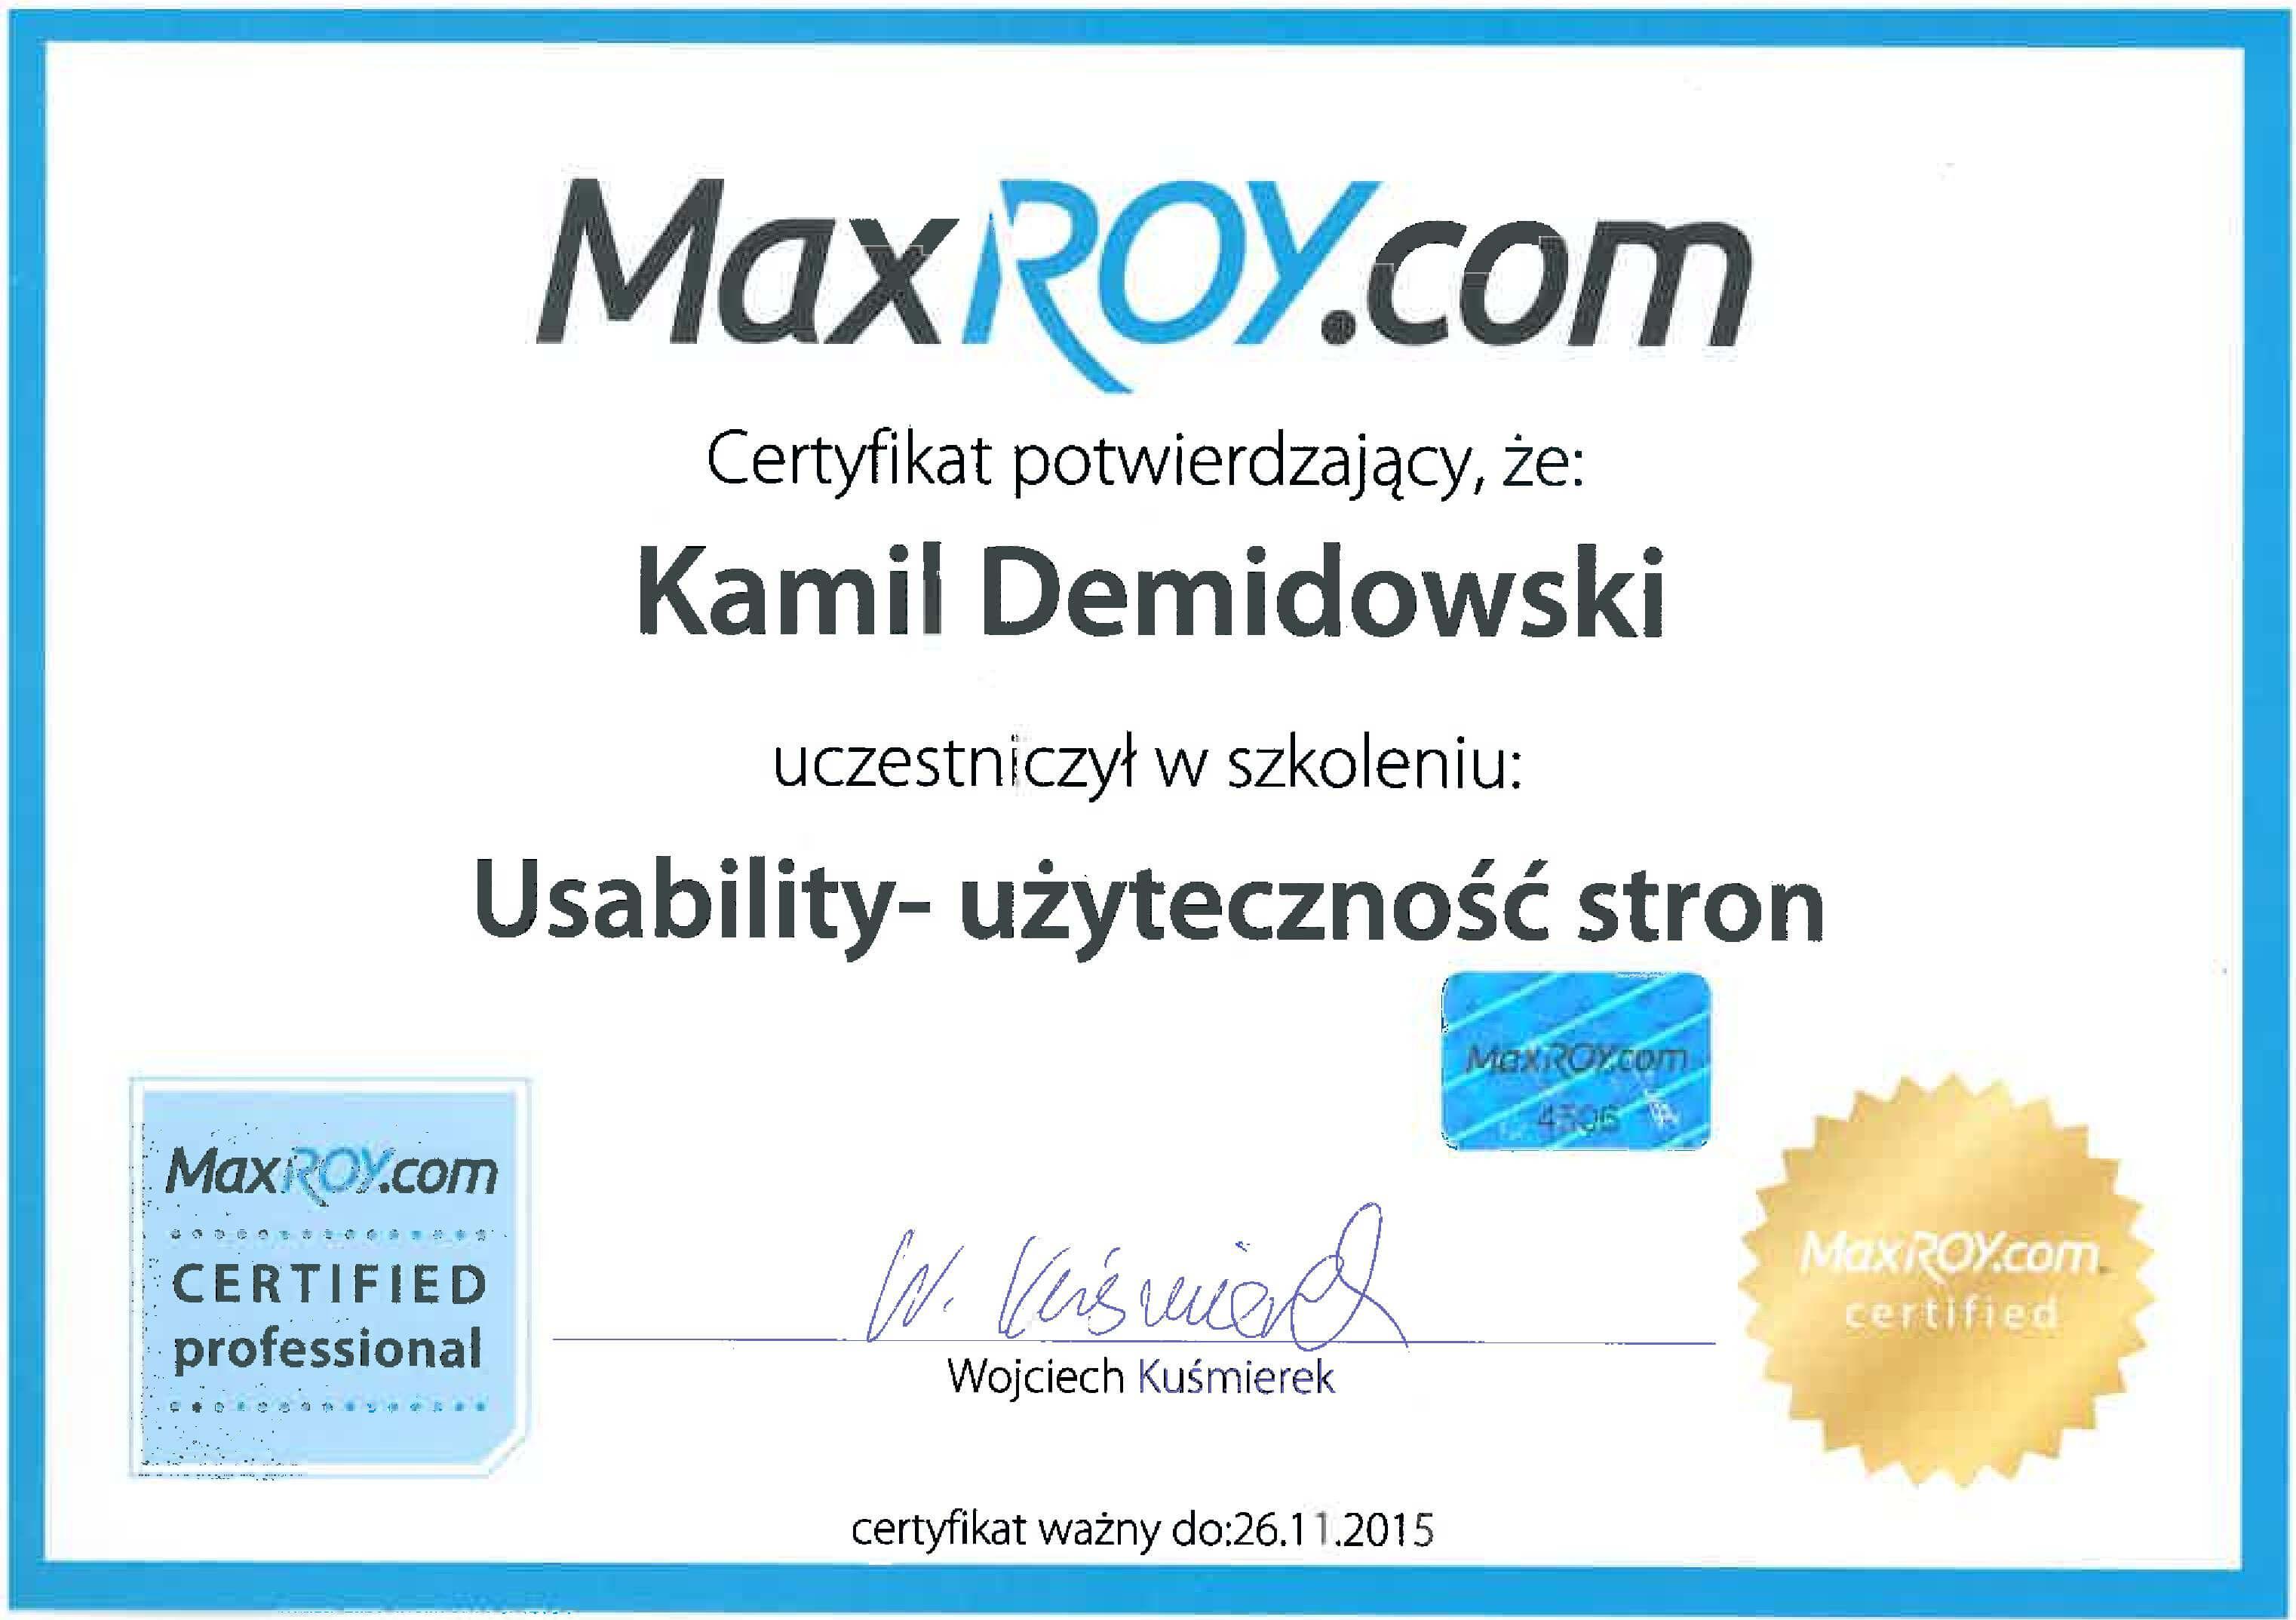 kamil-demidowski-usability